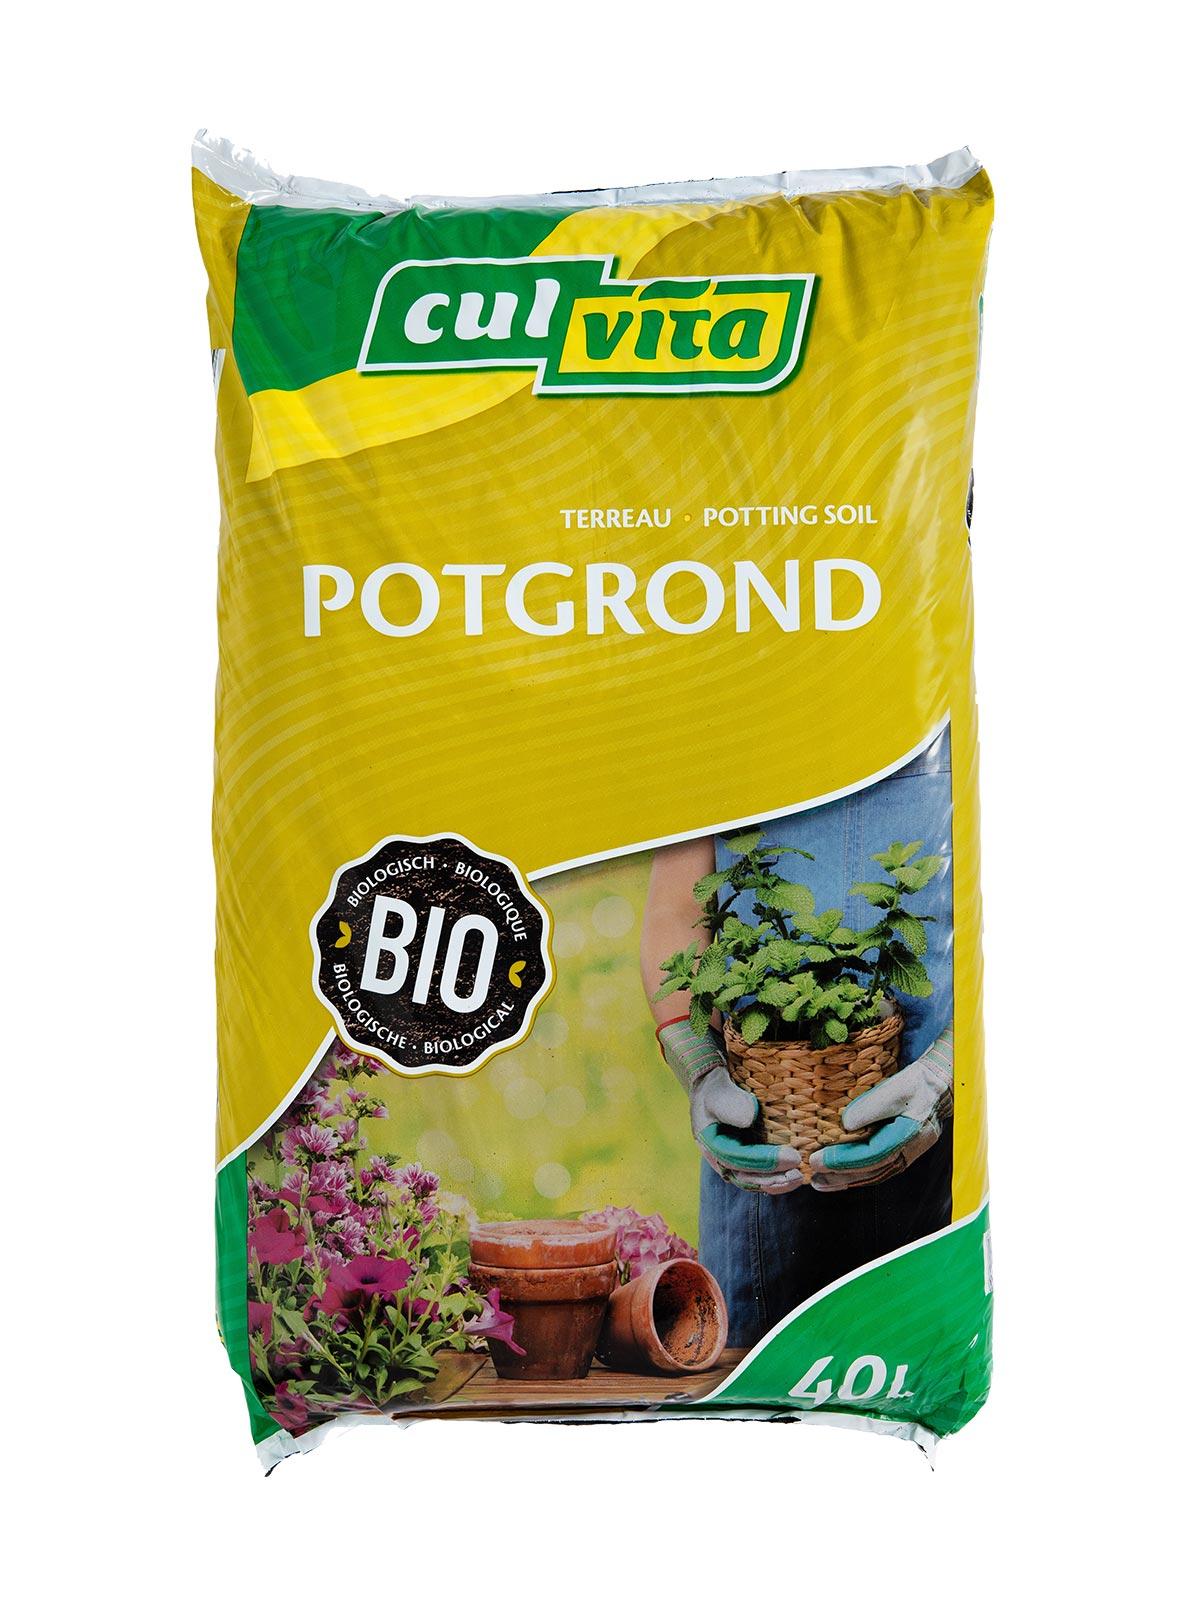 Culvita Biologische Potgrond | Culvita.nl